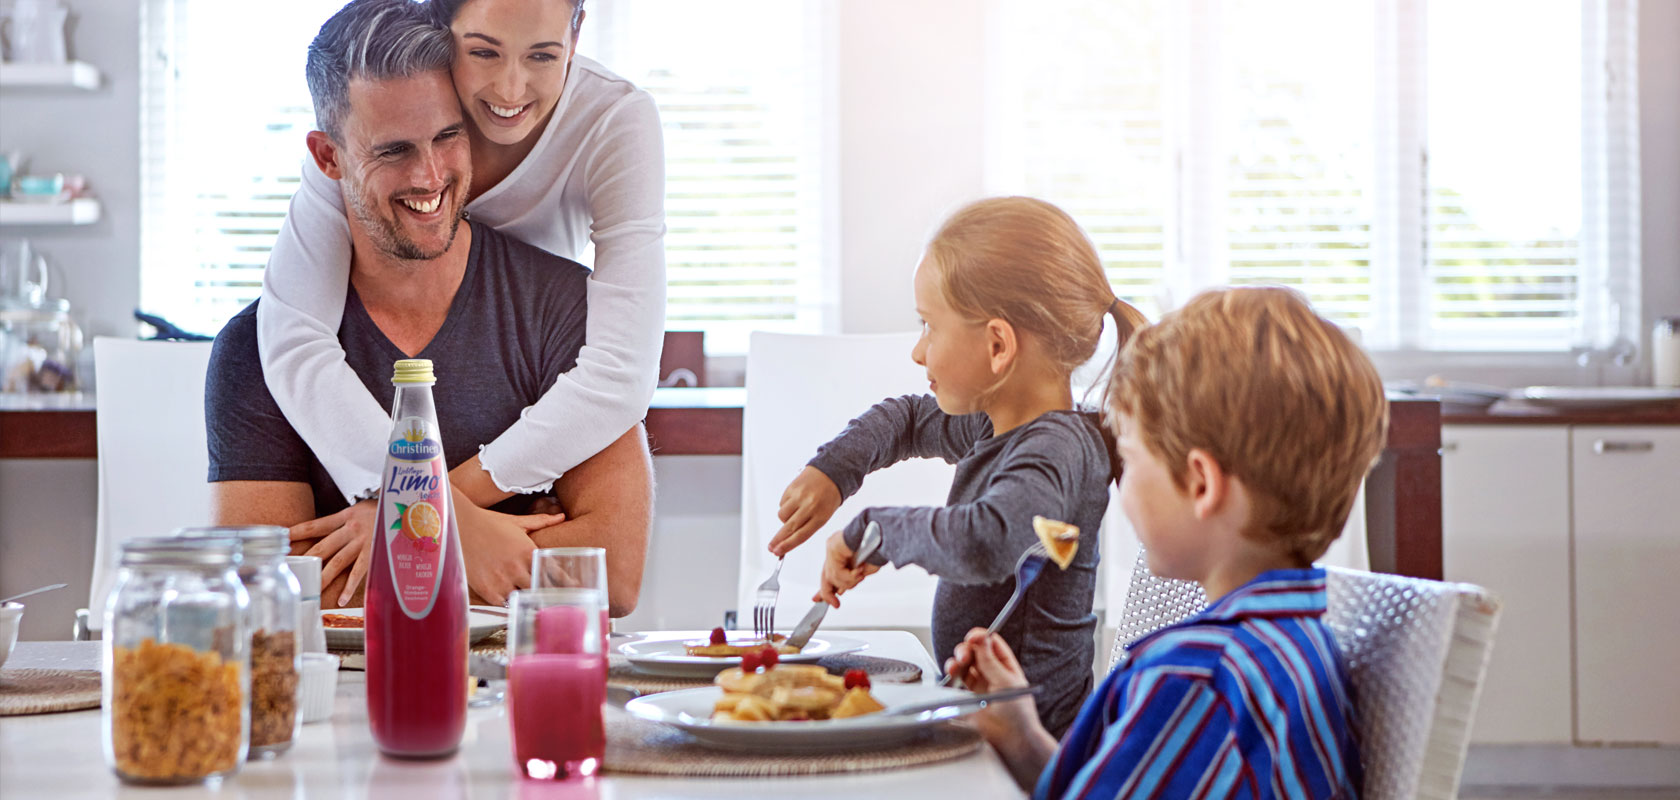 christinen lieblingslimo Familienwohl